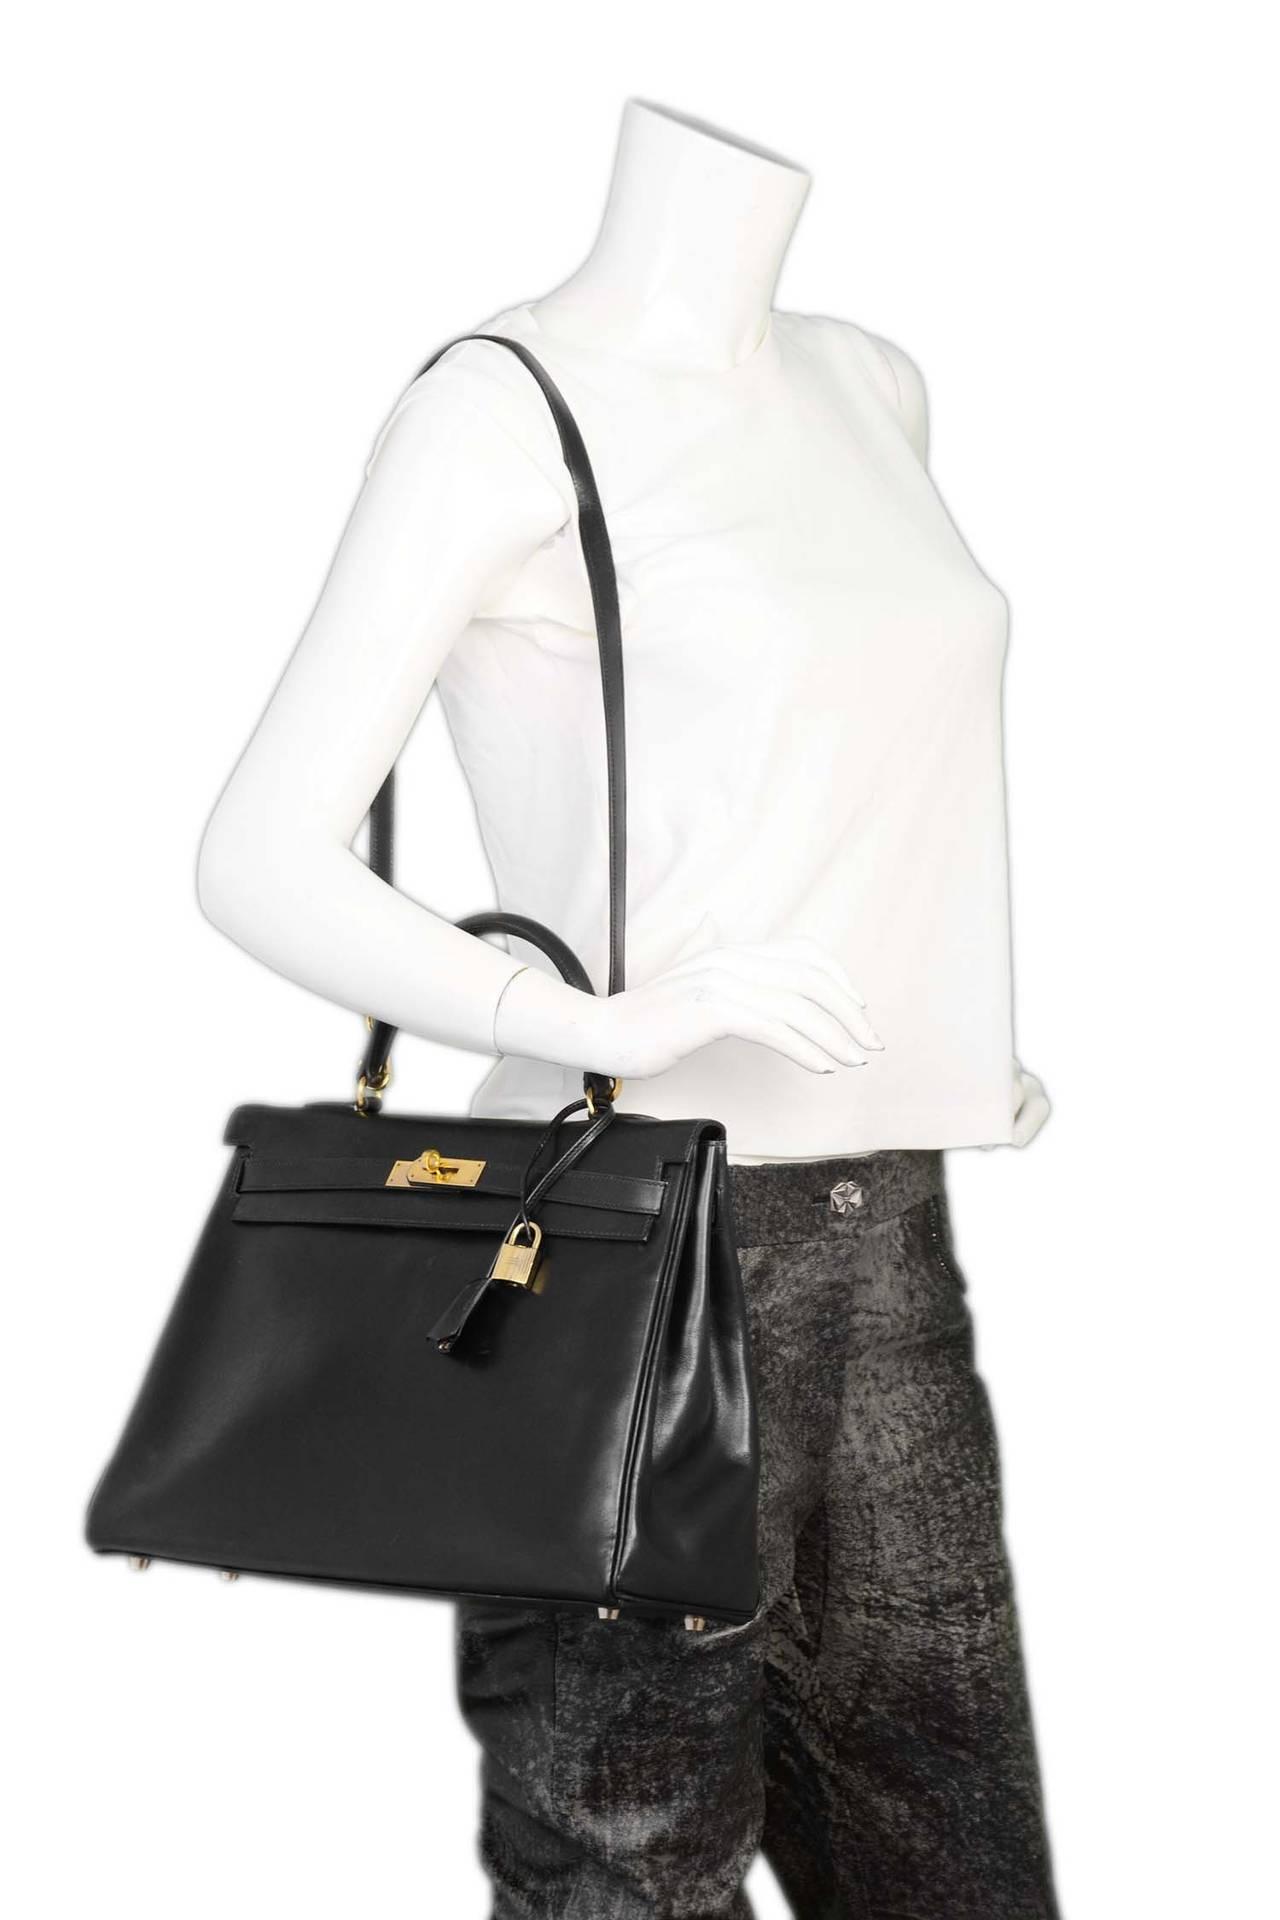 where to buy hermes birkin - HERMES 1995 Vintage Black Box Leather 35cm Retourne Kelly Bag GHW ...